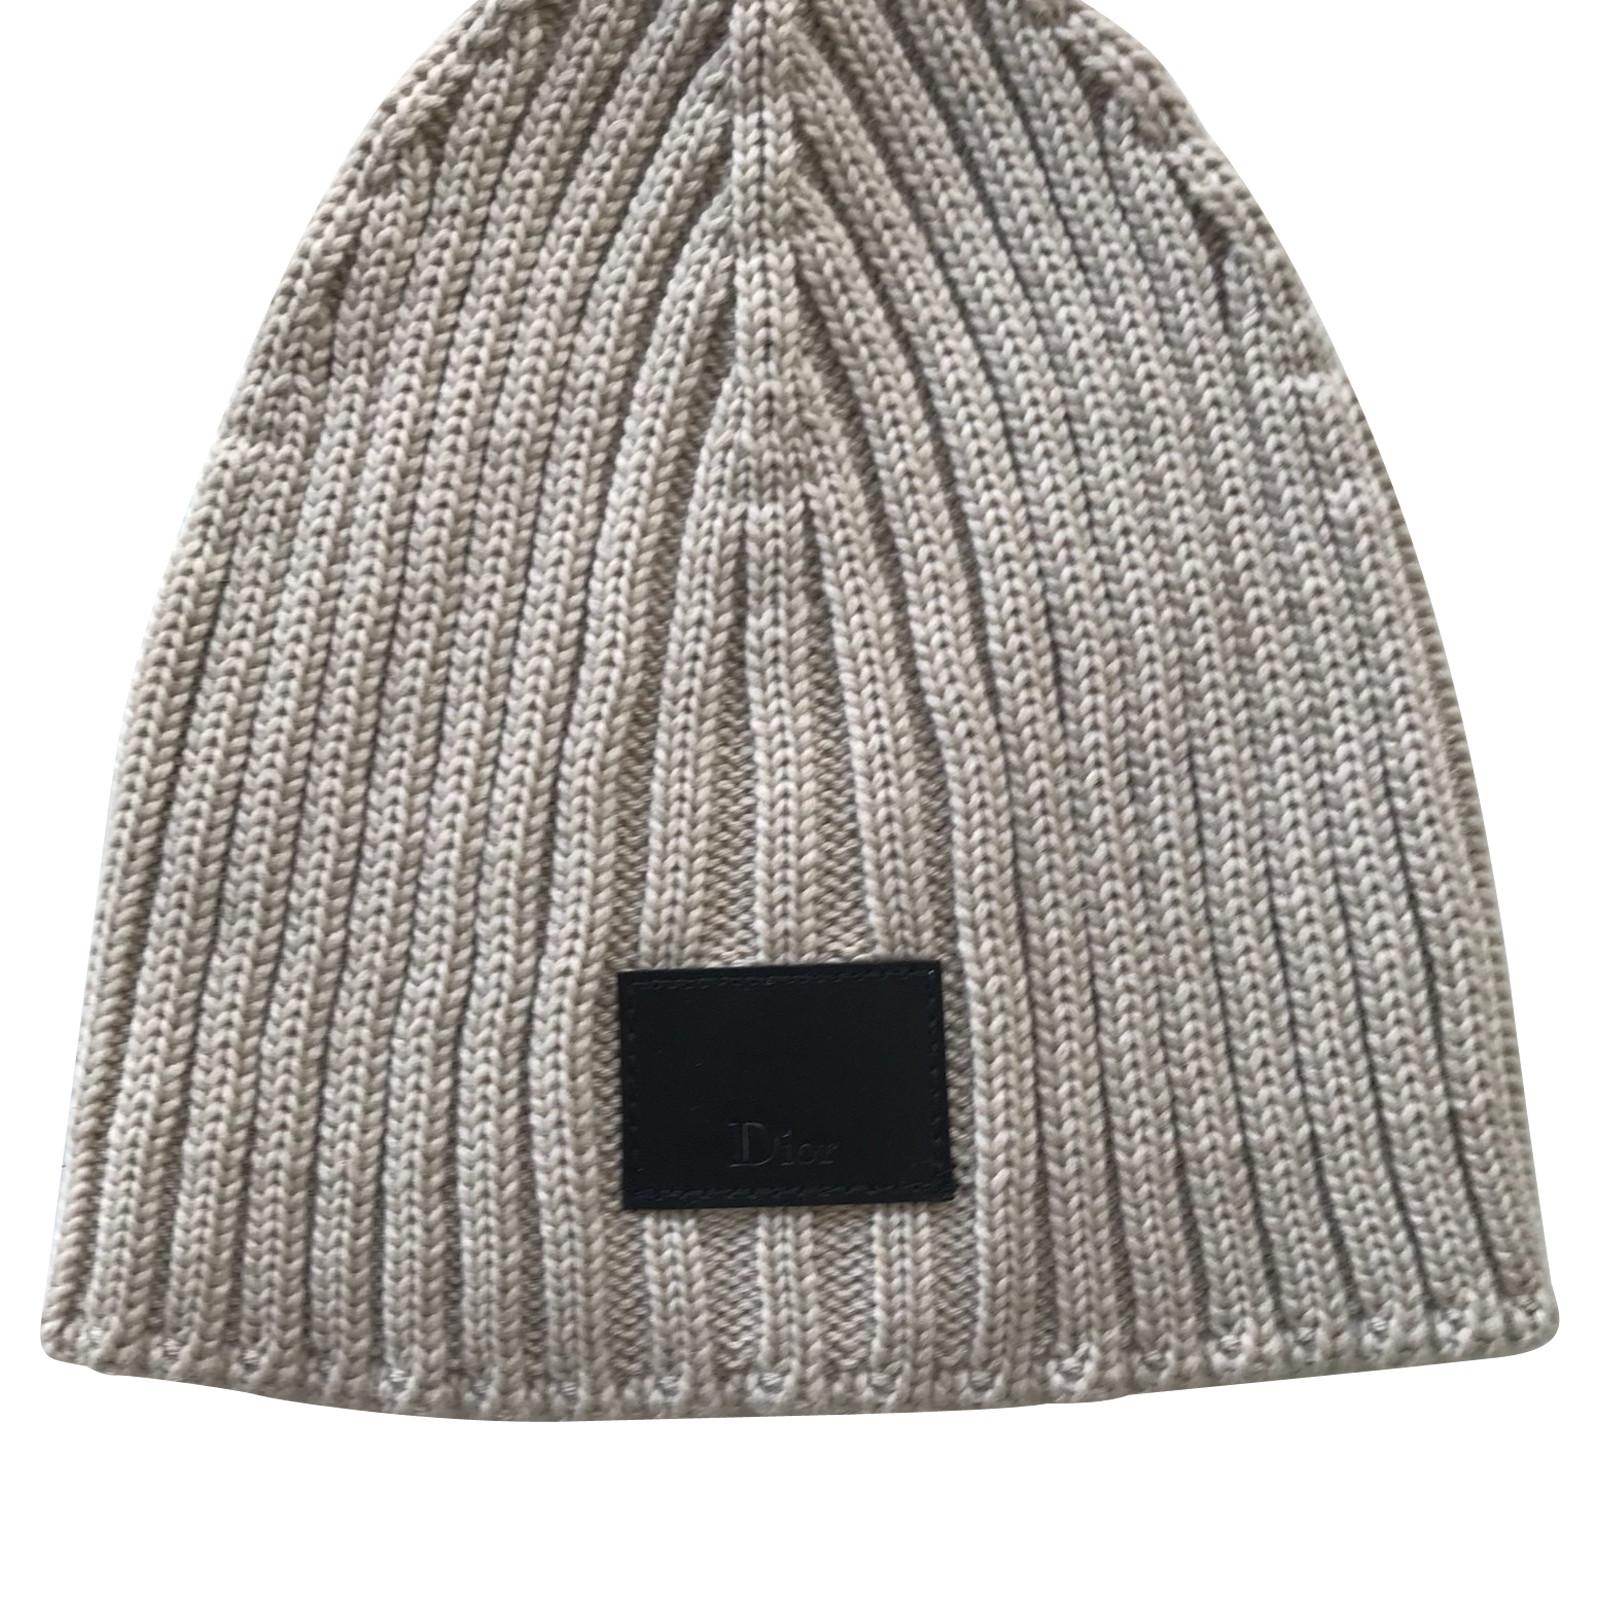 christian dior mütze aus wolle - second hand christian dior